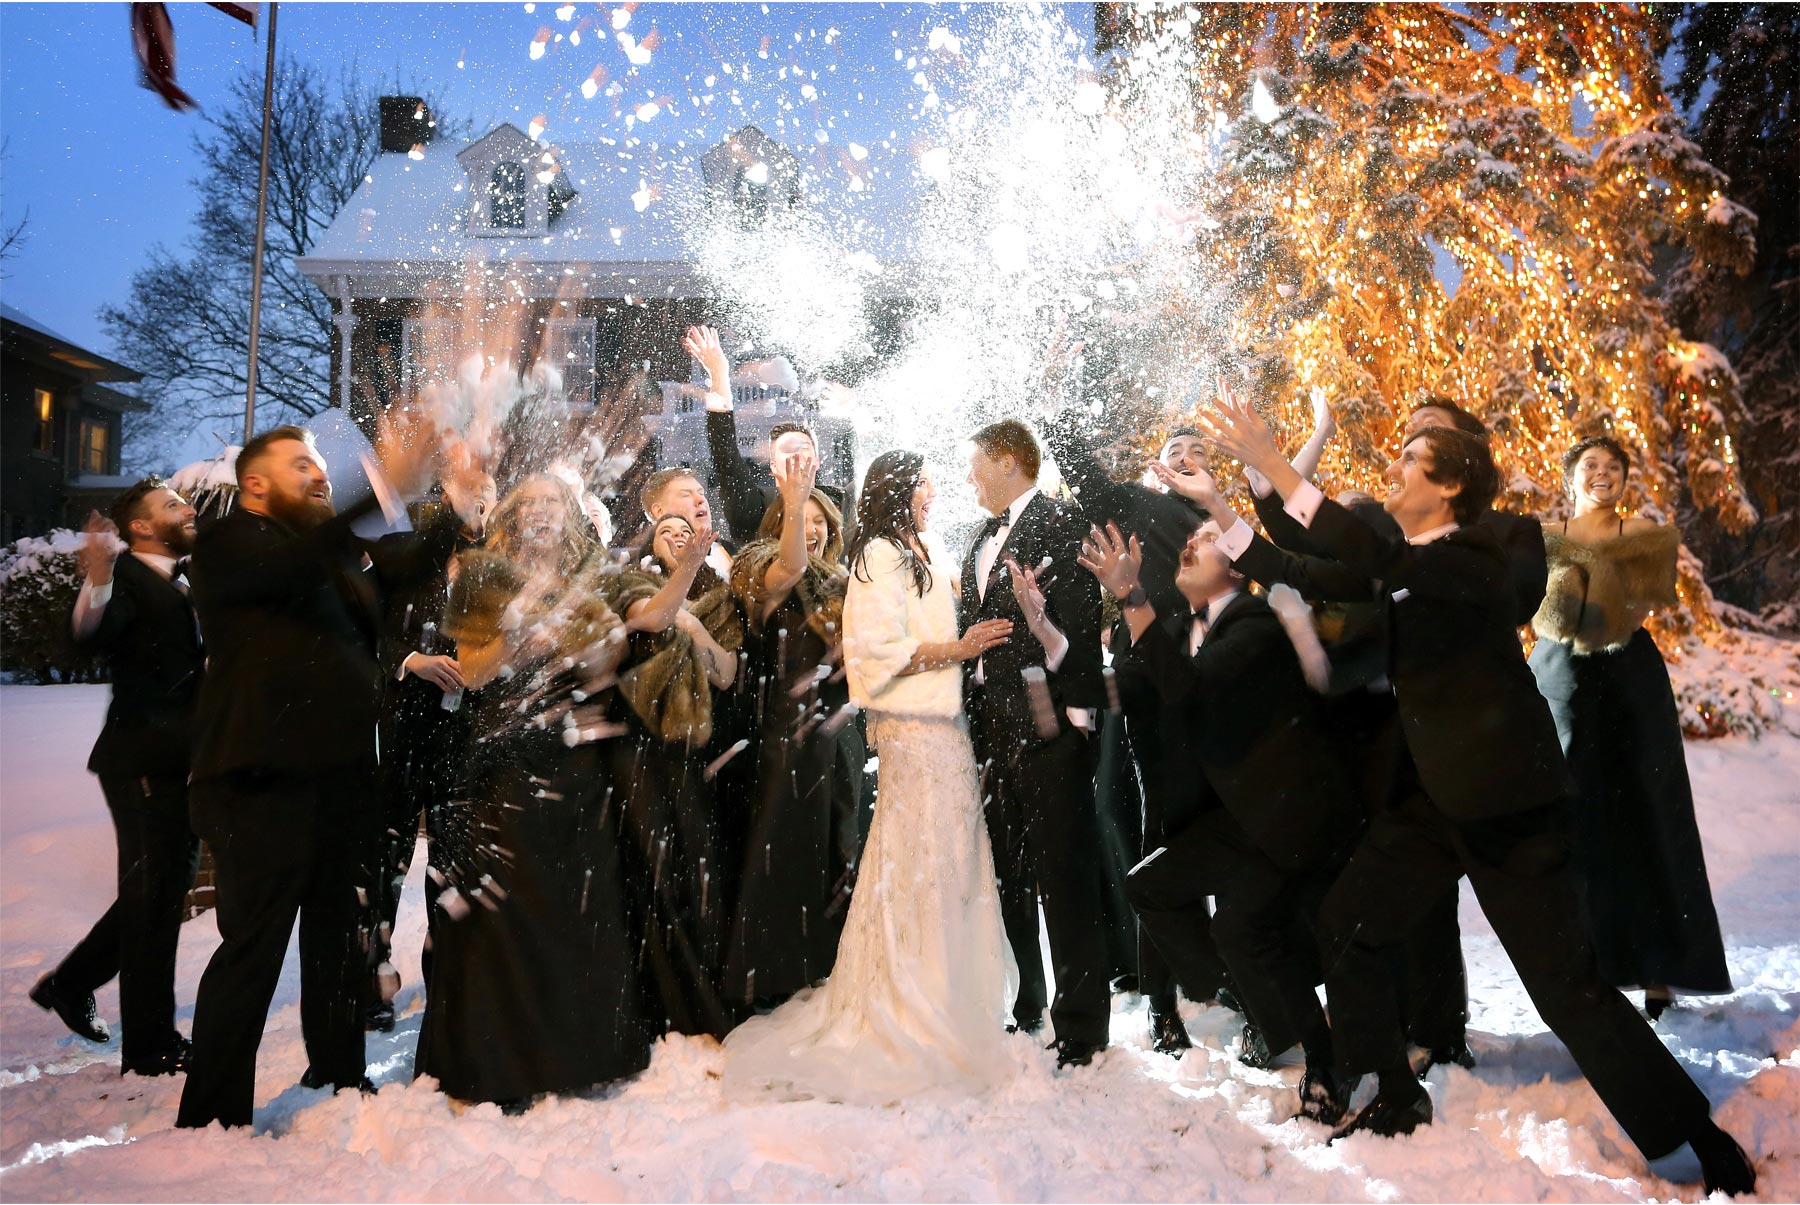 20-Saint-Paul-Minnesota-Wedding-Photography-by-Vick-Photography-Wedding-Party-Group-Snow-Ball-Fight-Winter-Wedding-Sami-and-Nick.jpg